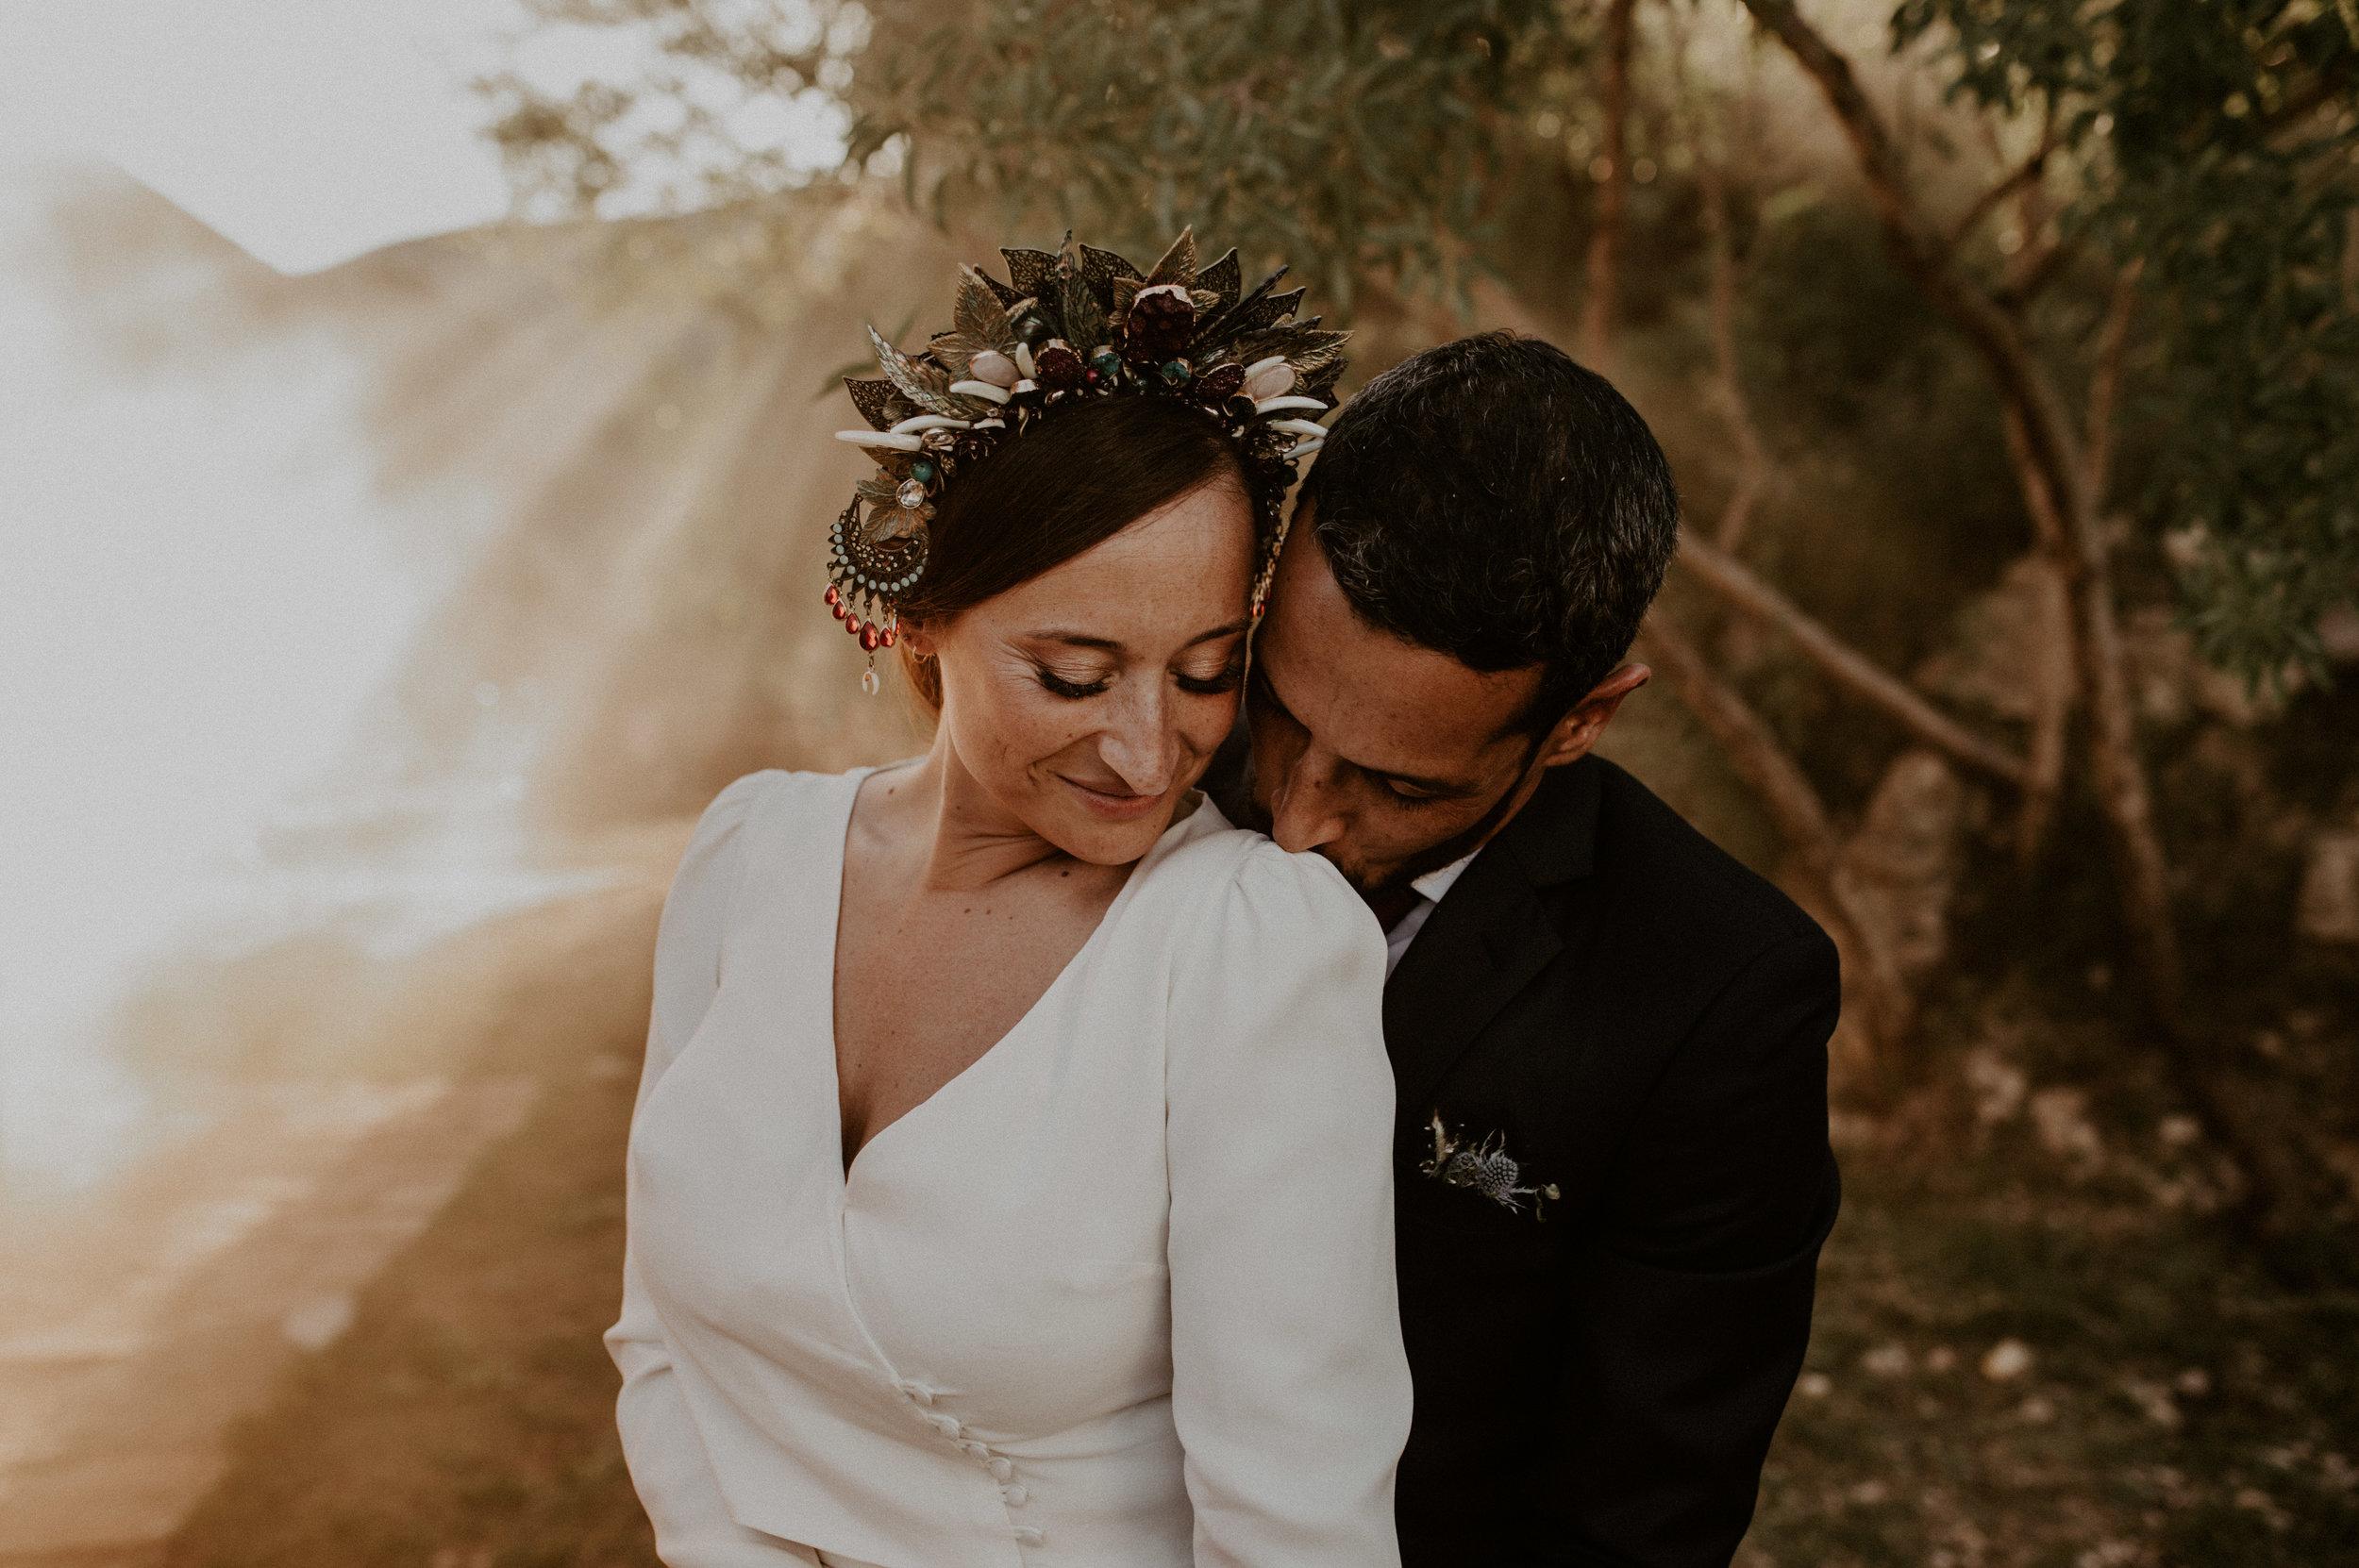 thenortherngirlphotography-fotografa-de-bodas-barcelona_destinartion-wedding-photographer_wedding-photographer_moroccan-wedding_HADNANANTIGONA-750.jpg